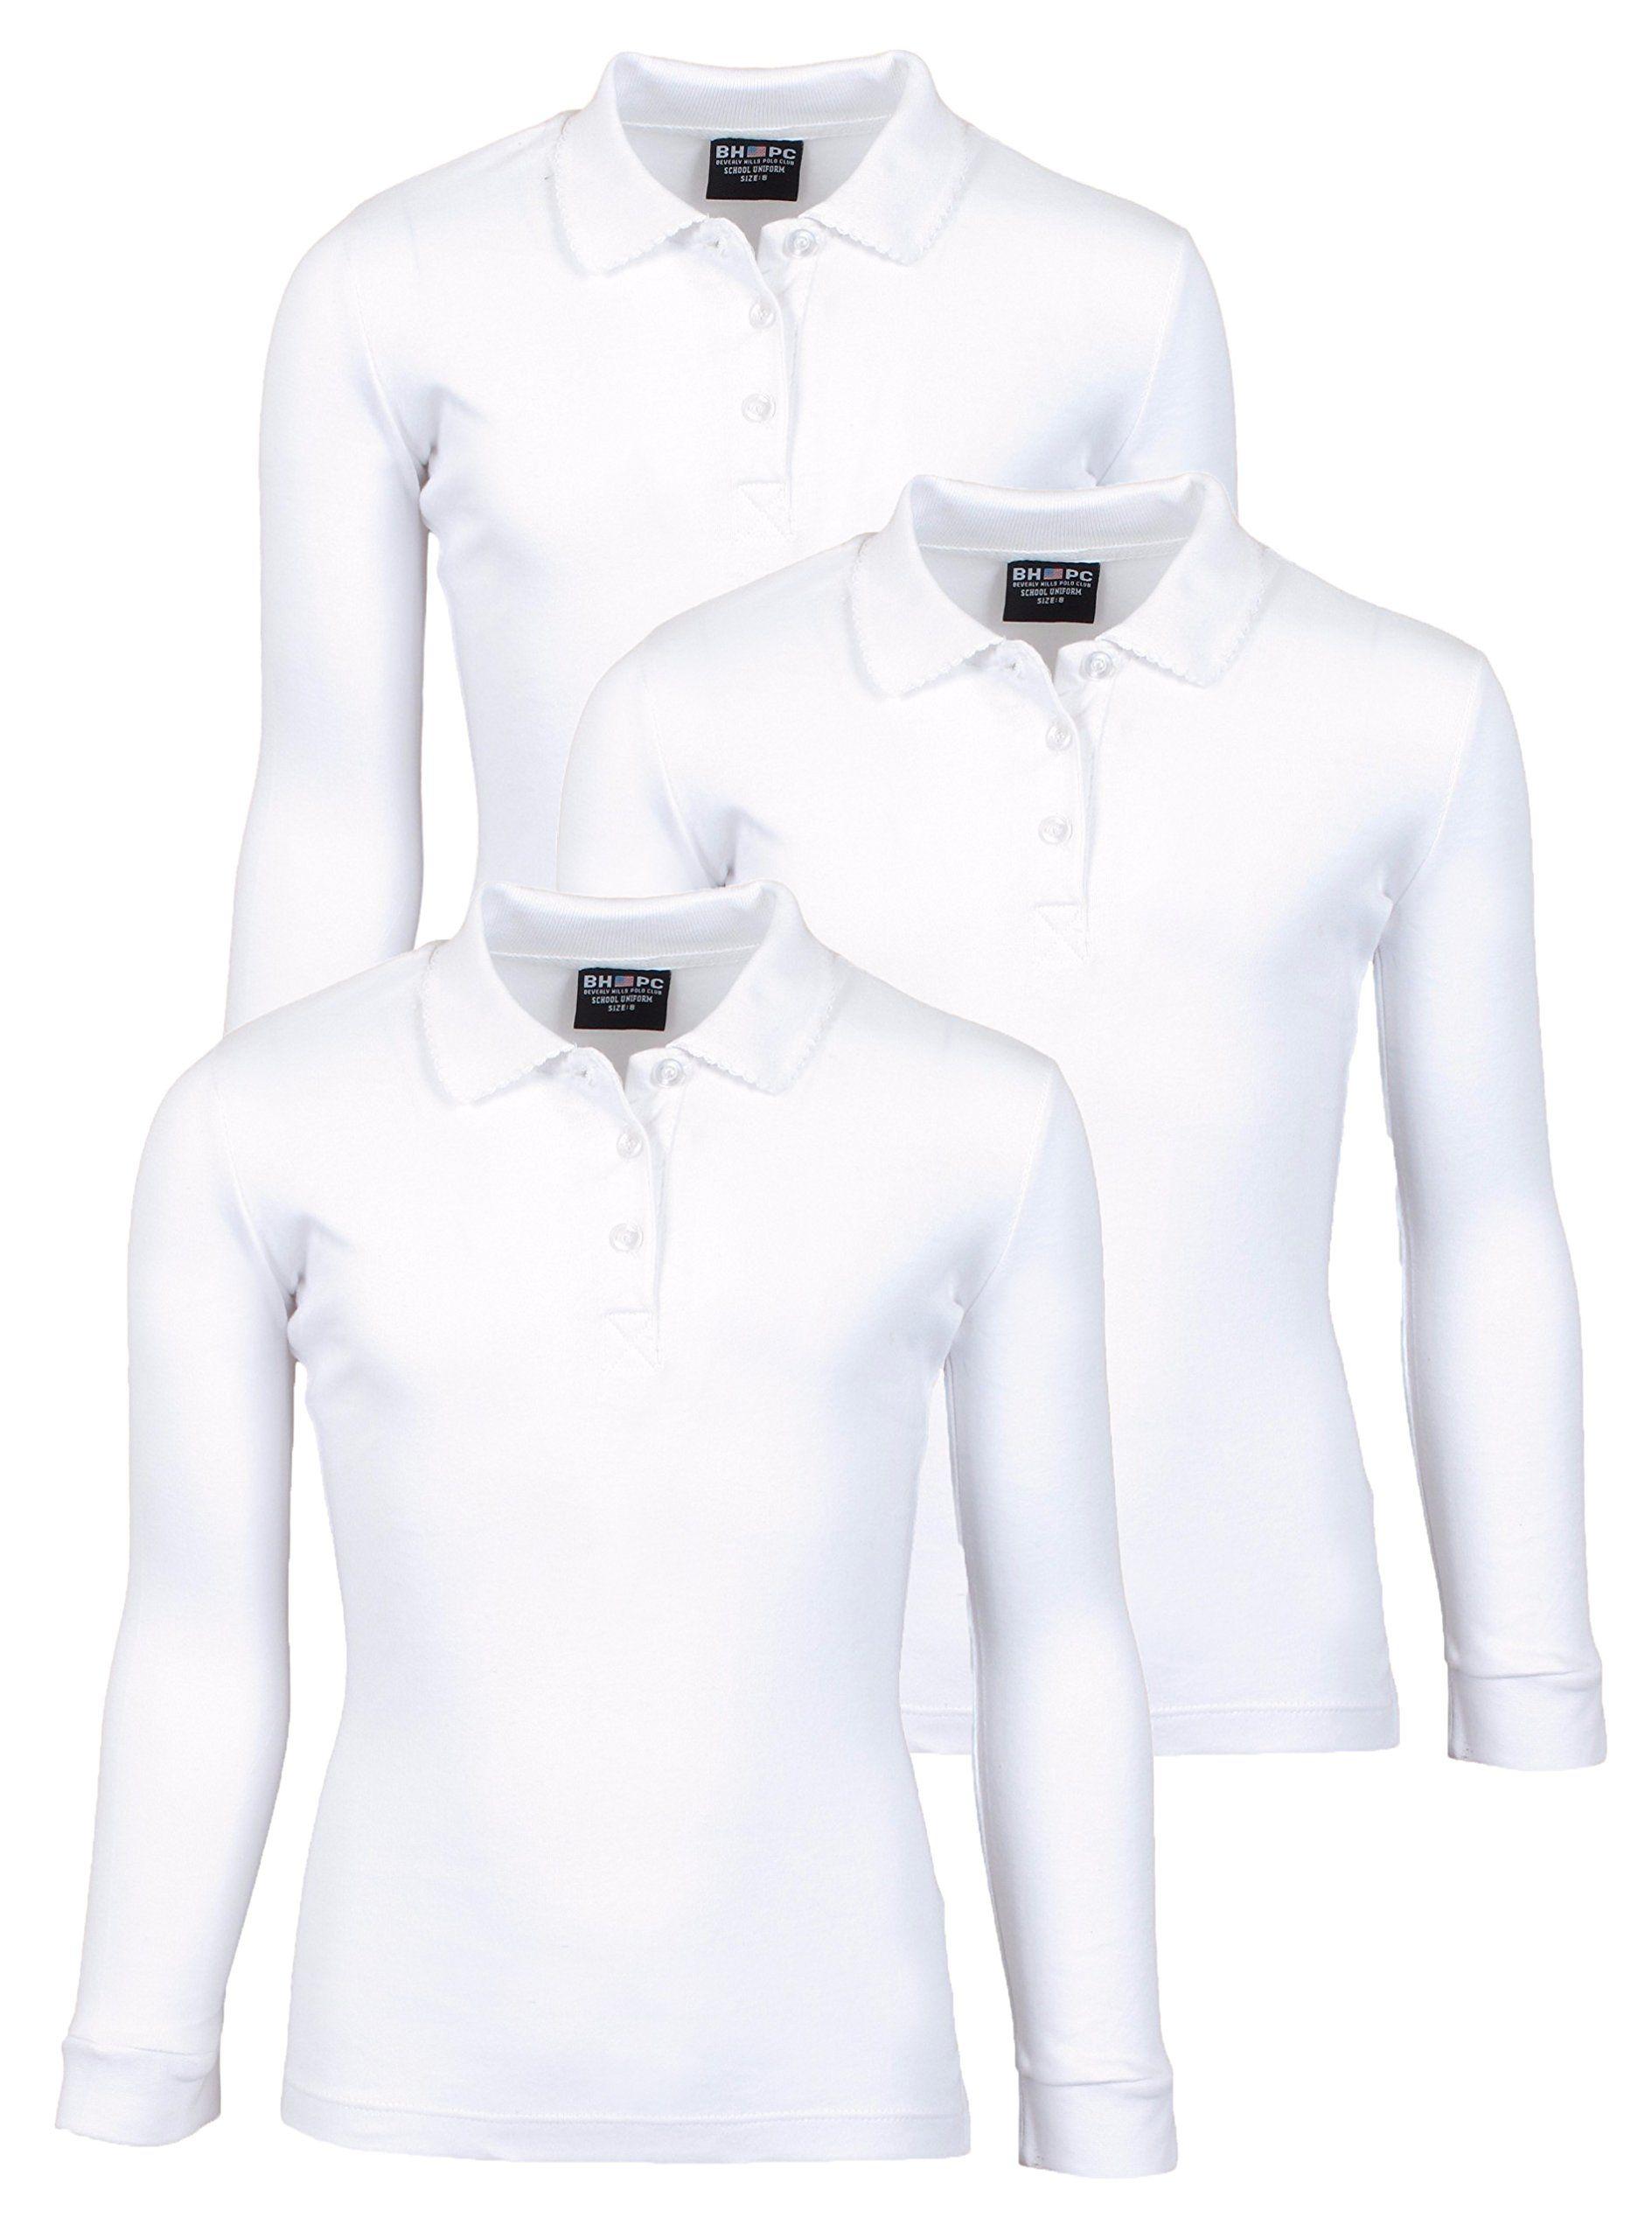 Beverly Hills Polo Club 3 Pack of Girls\ Long Sleeve Interlock ...